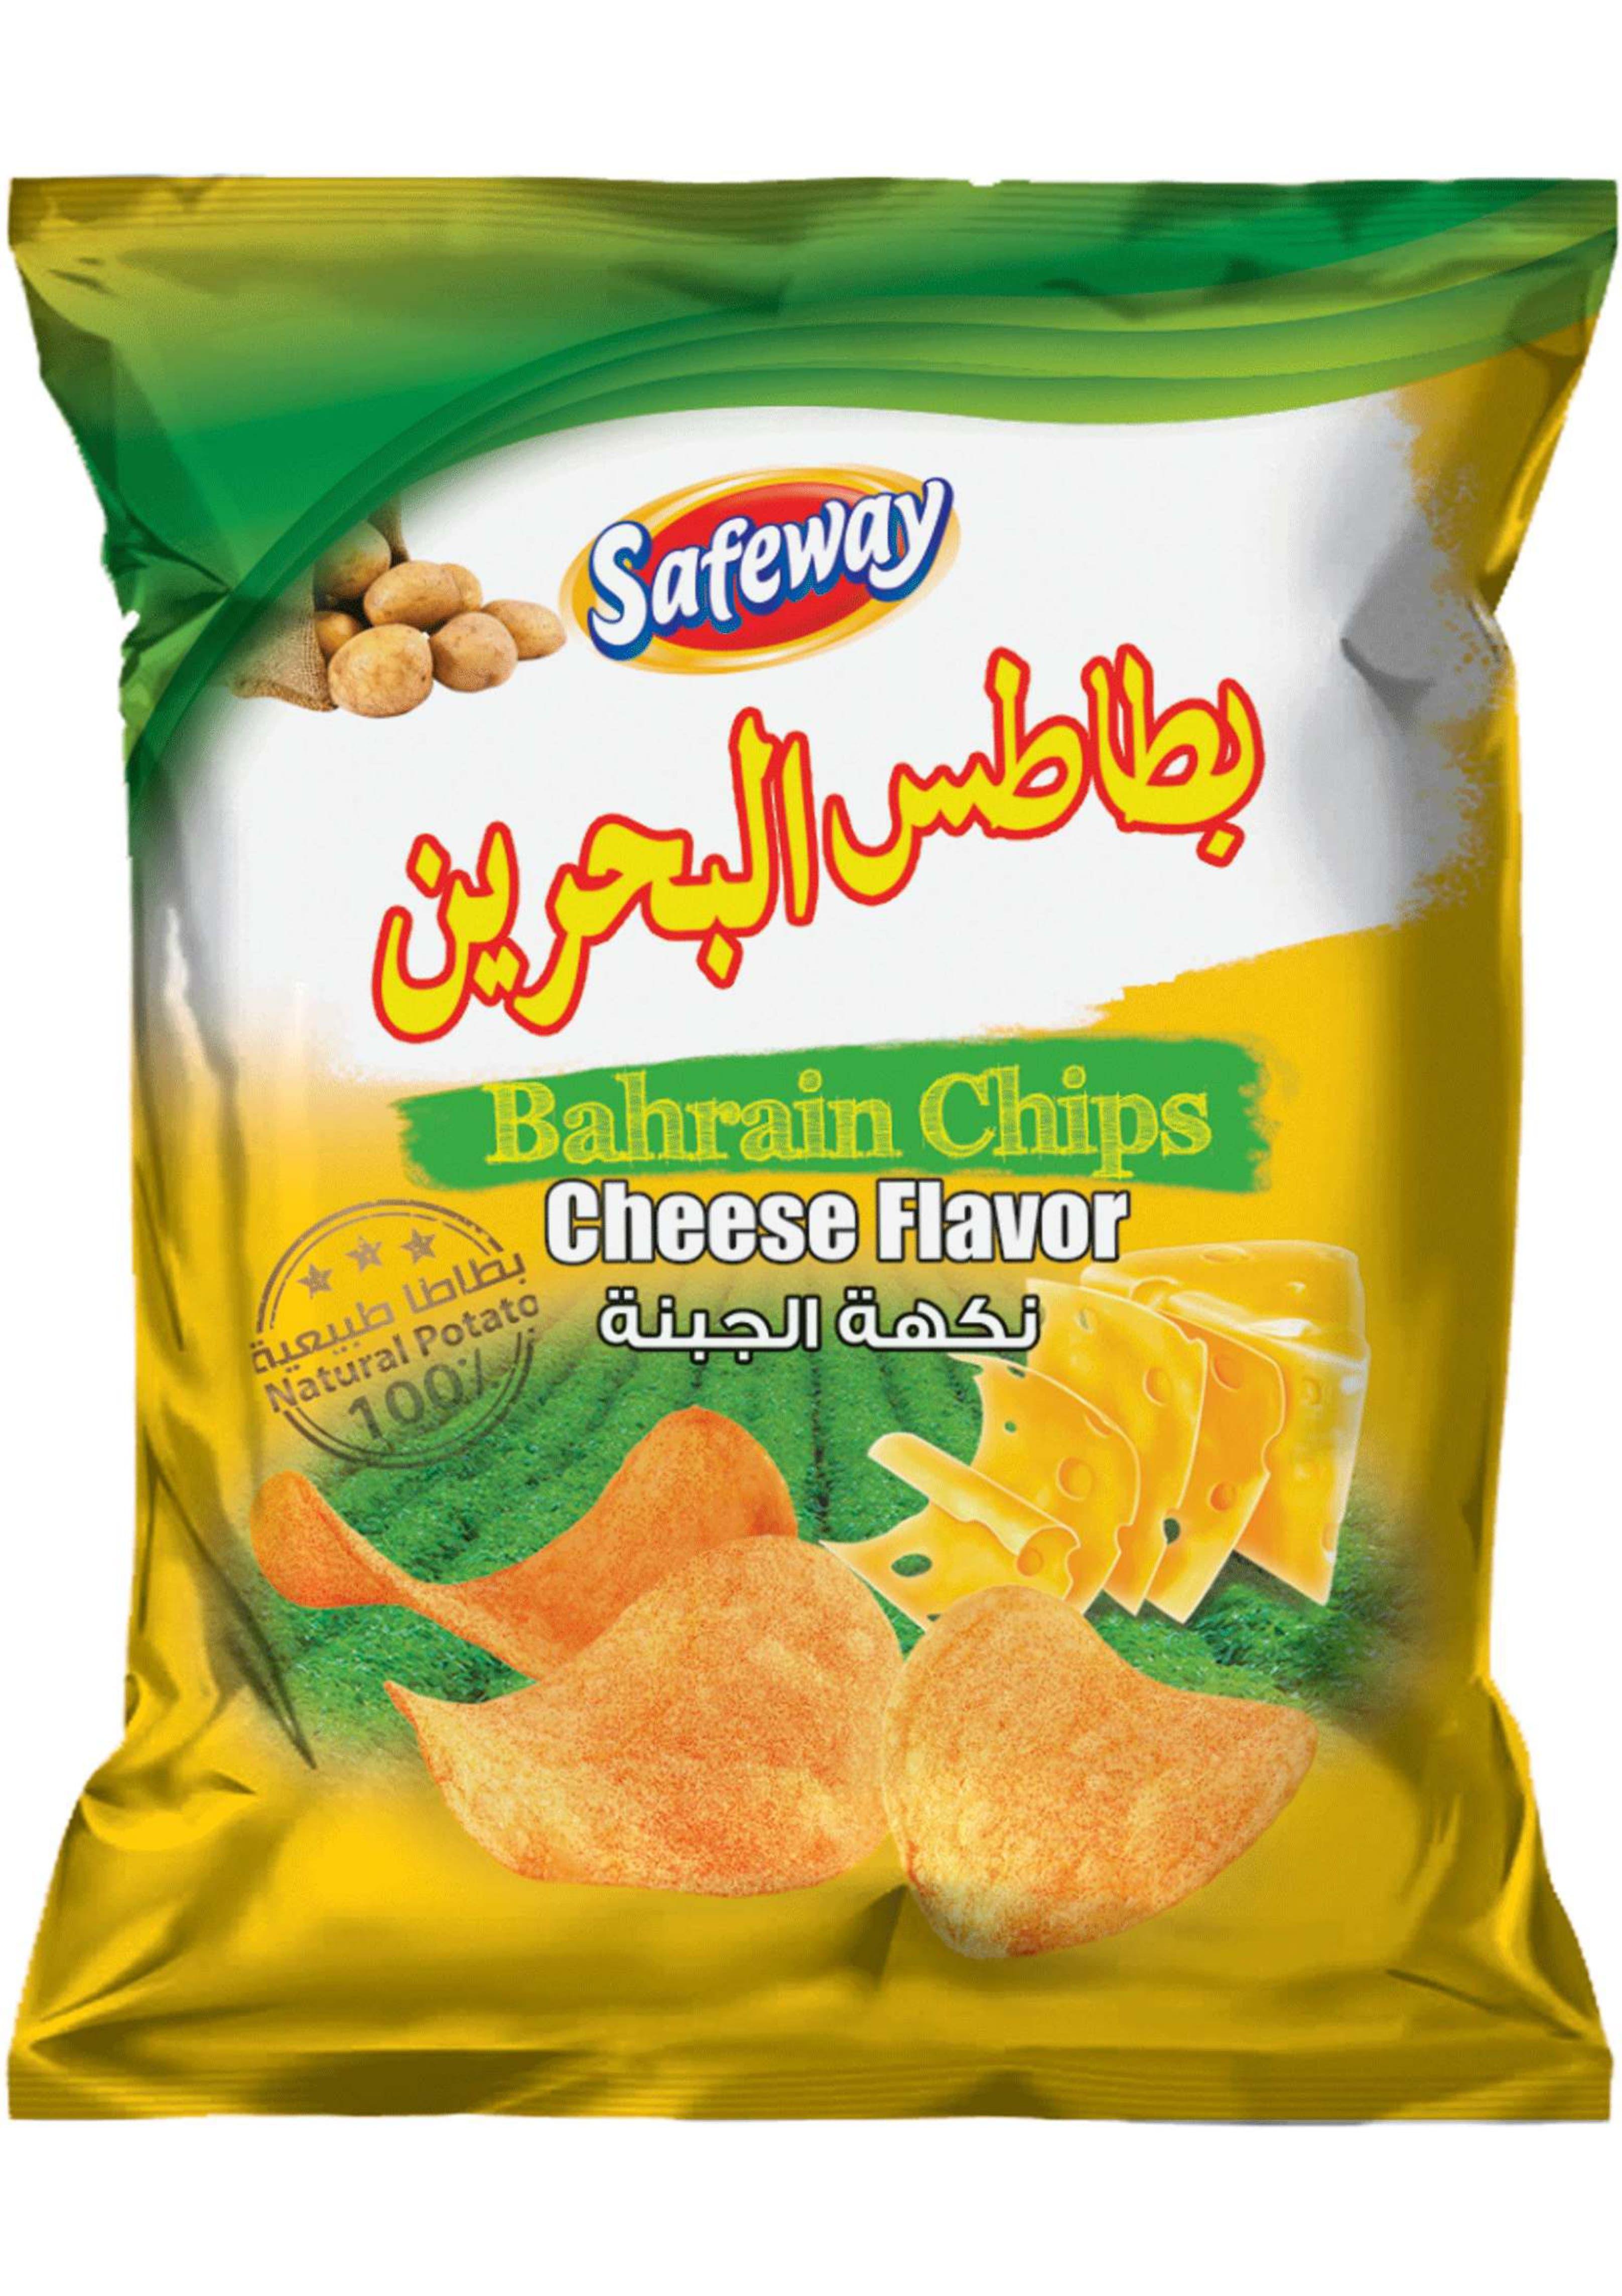 Bahrain chips